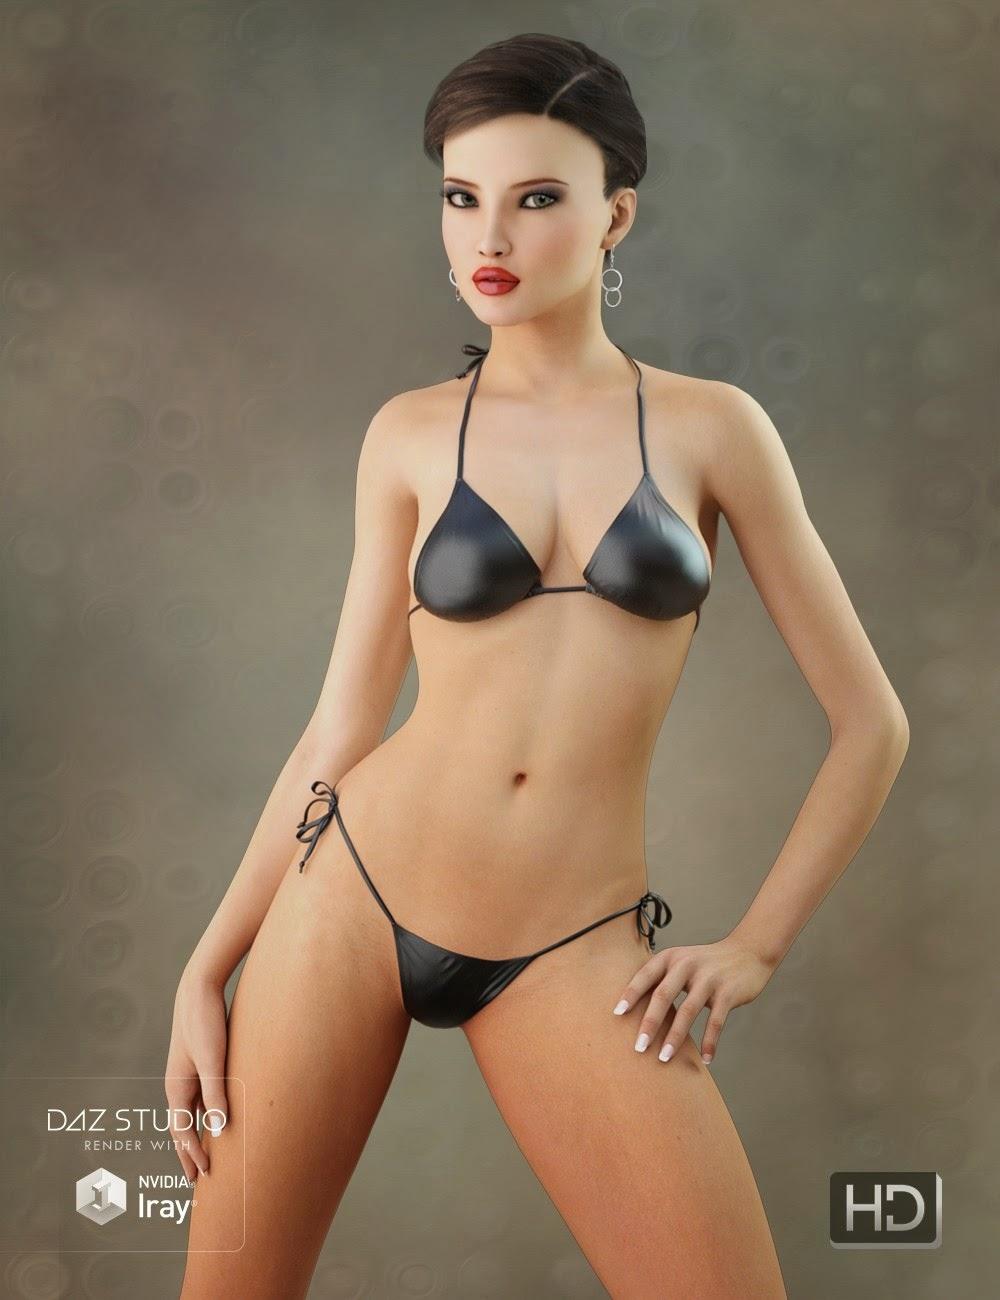 3d Models Art Zone - LYFW Adrienne HD for Victoria 6